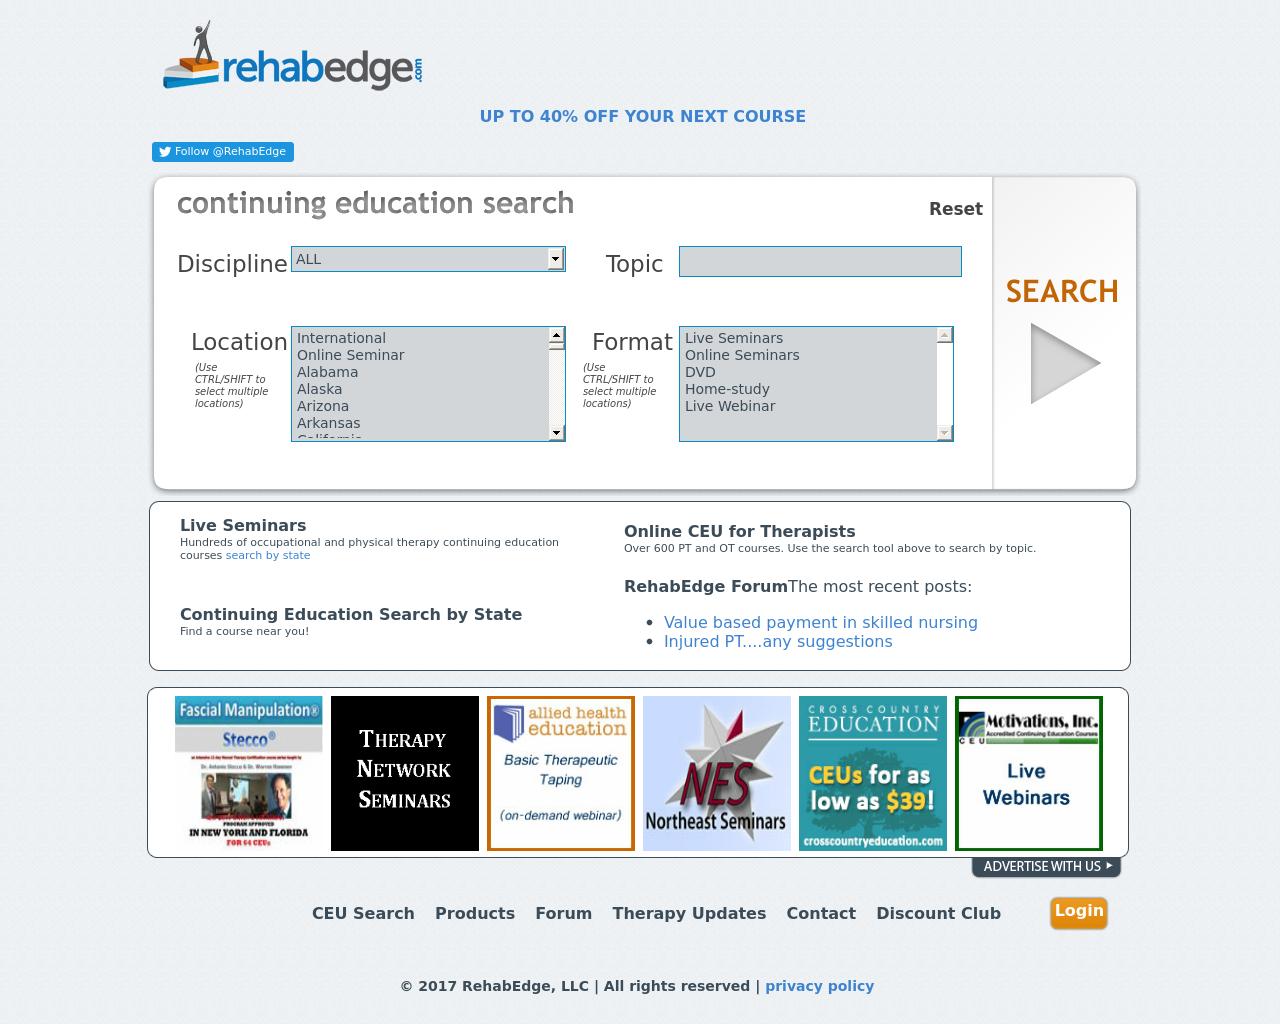 rehabedge.com-Advertising-Reviews-Pricing